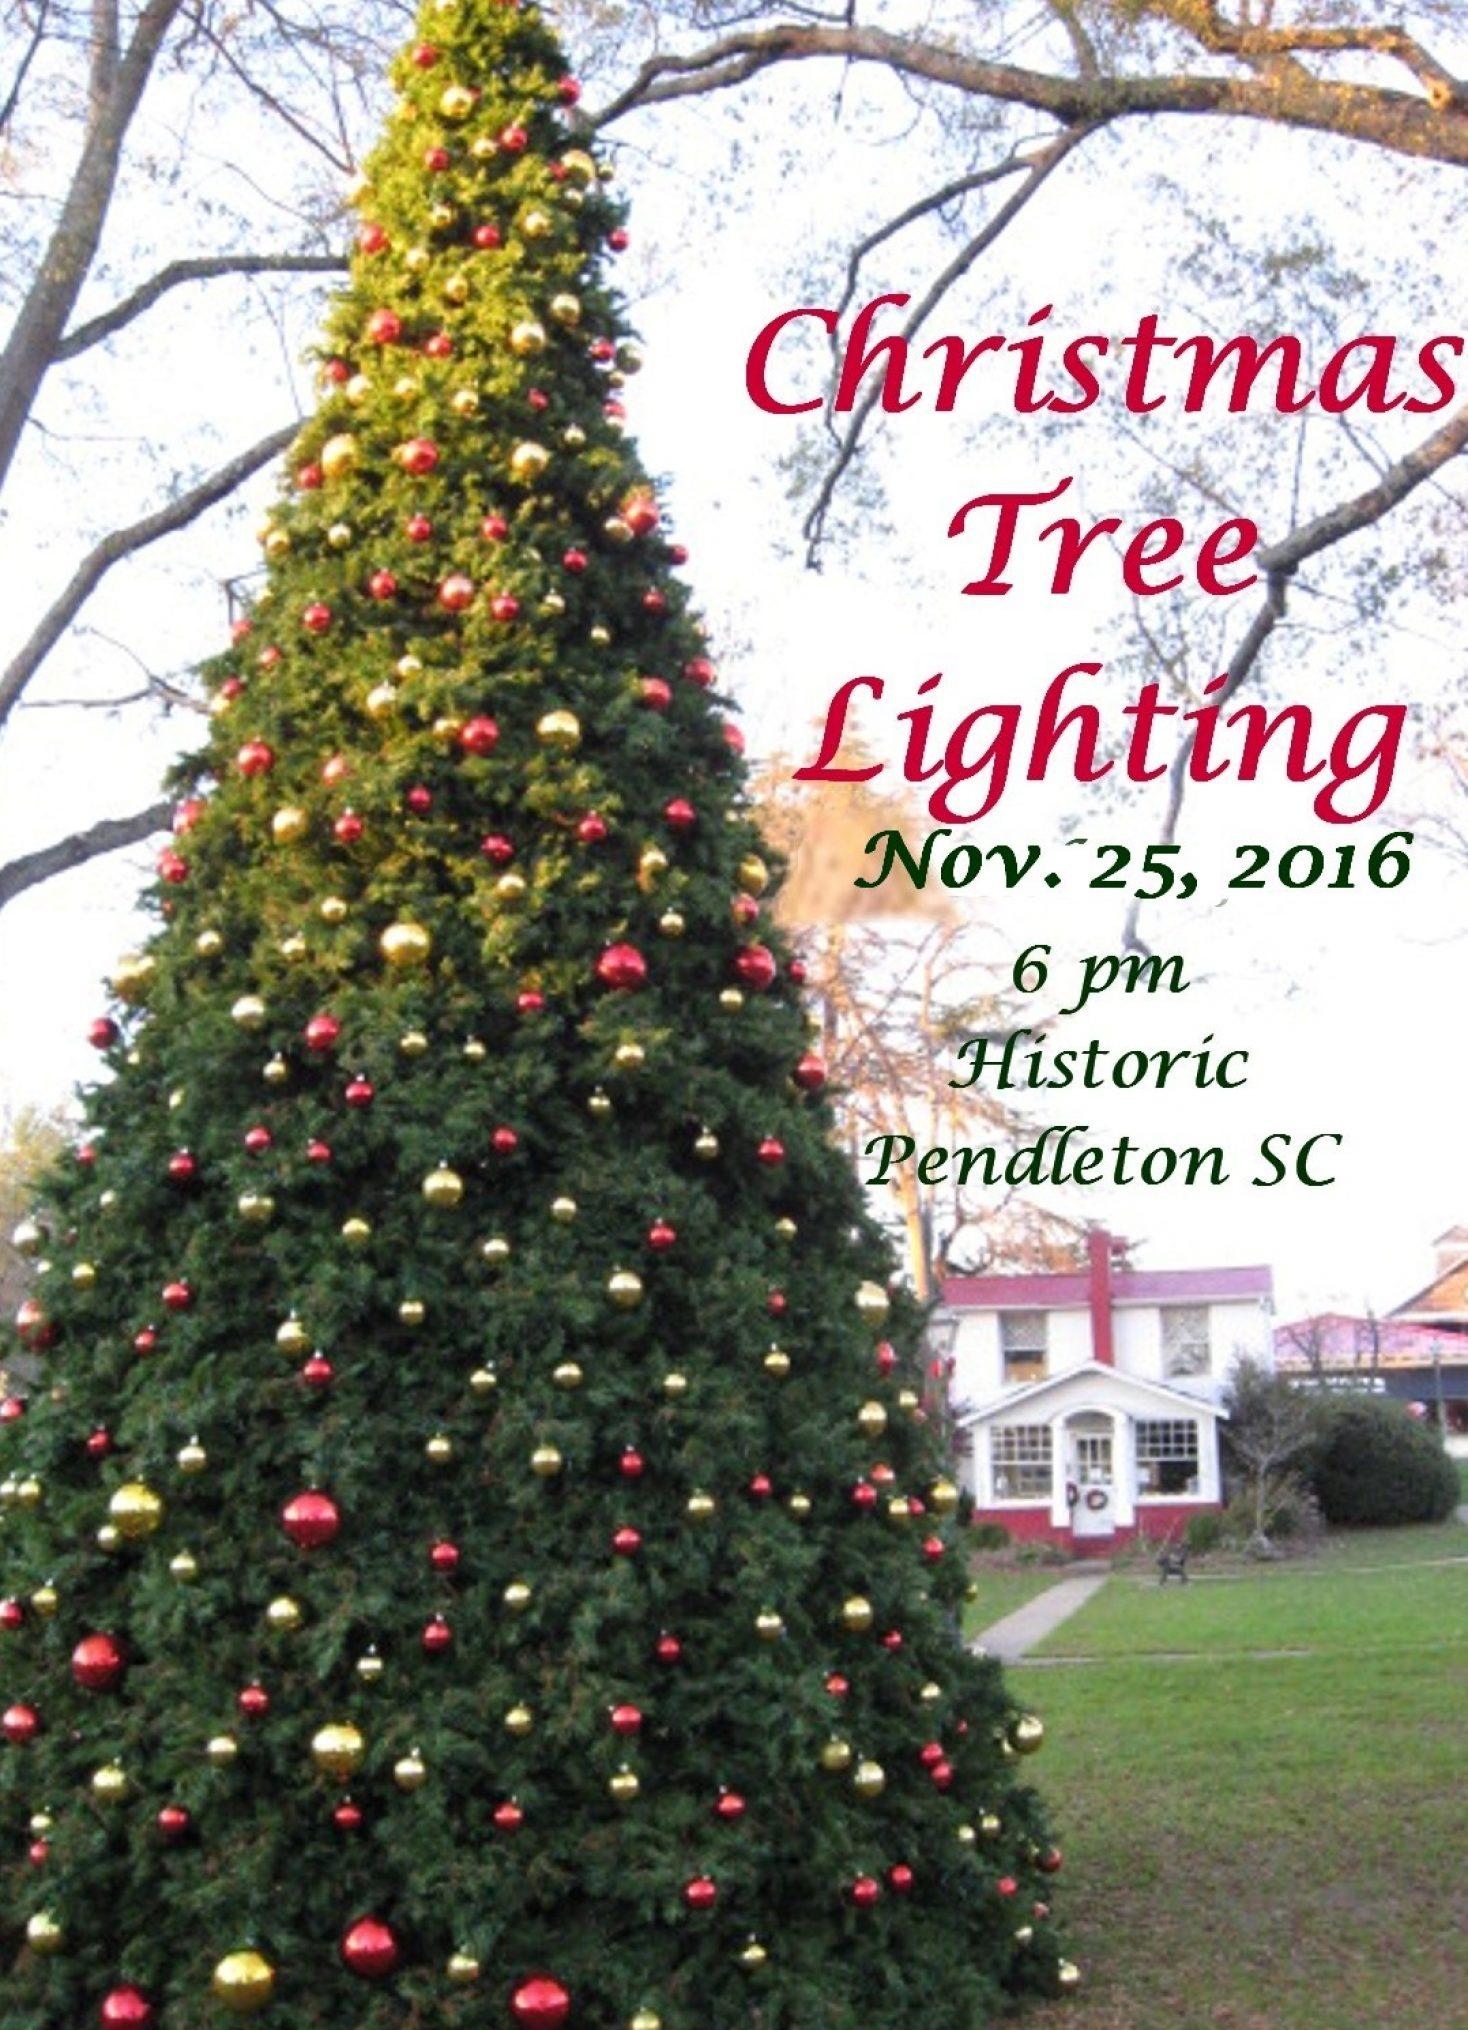 Annual Christmas Tree Lighting Ceremony